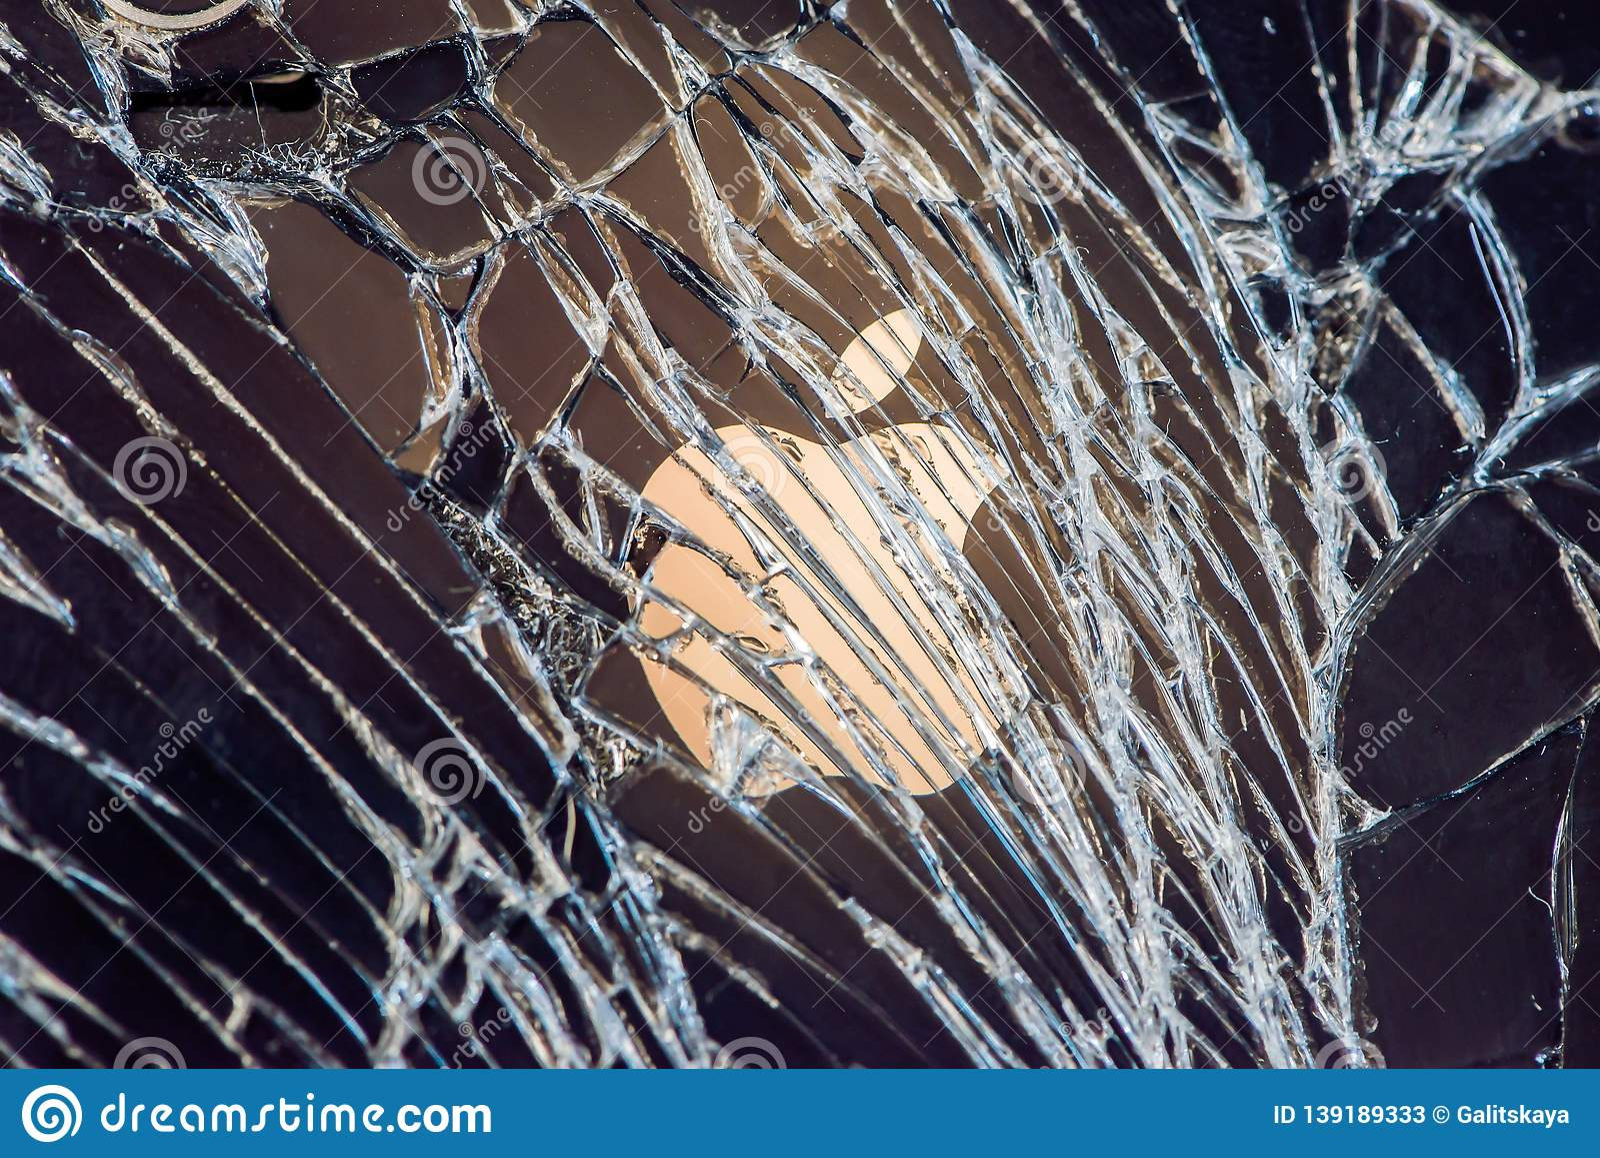 BANGKOK, THAILAND -AUGUST 23, 2017: Studio shot of Broken iphone